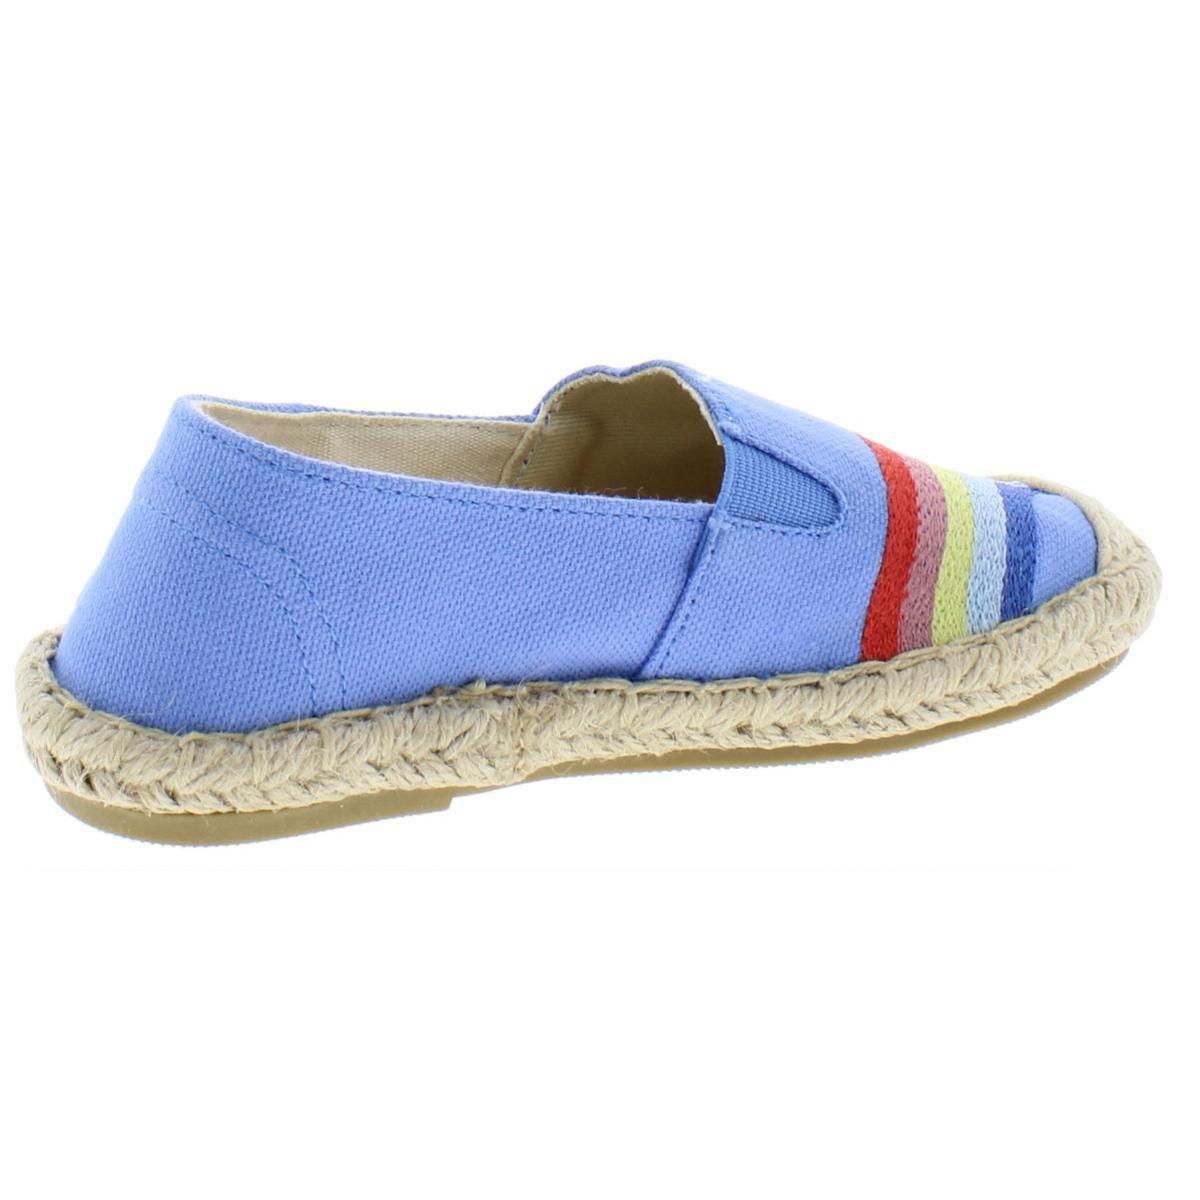 Joules Girls Espadrilles Blue Size 2 Medium (B,M) Little Kid